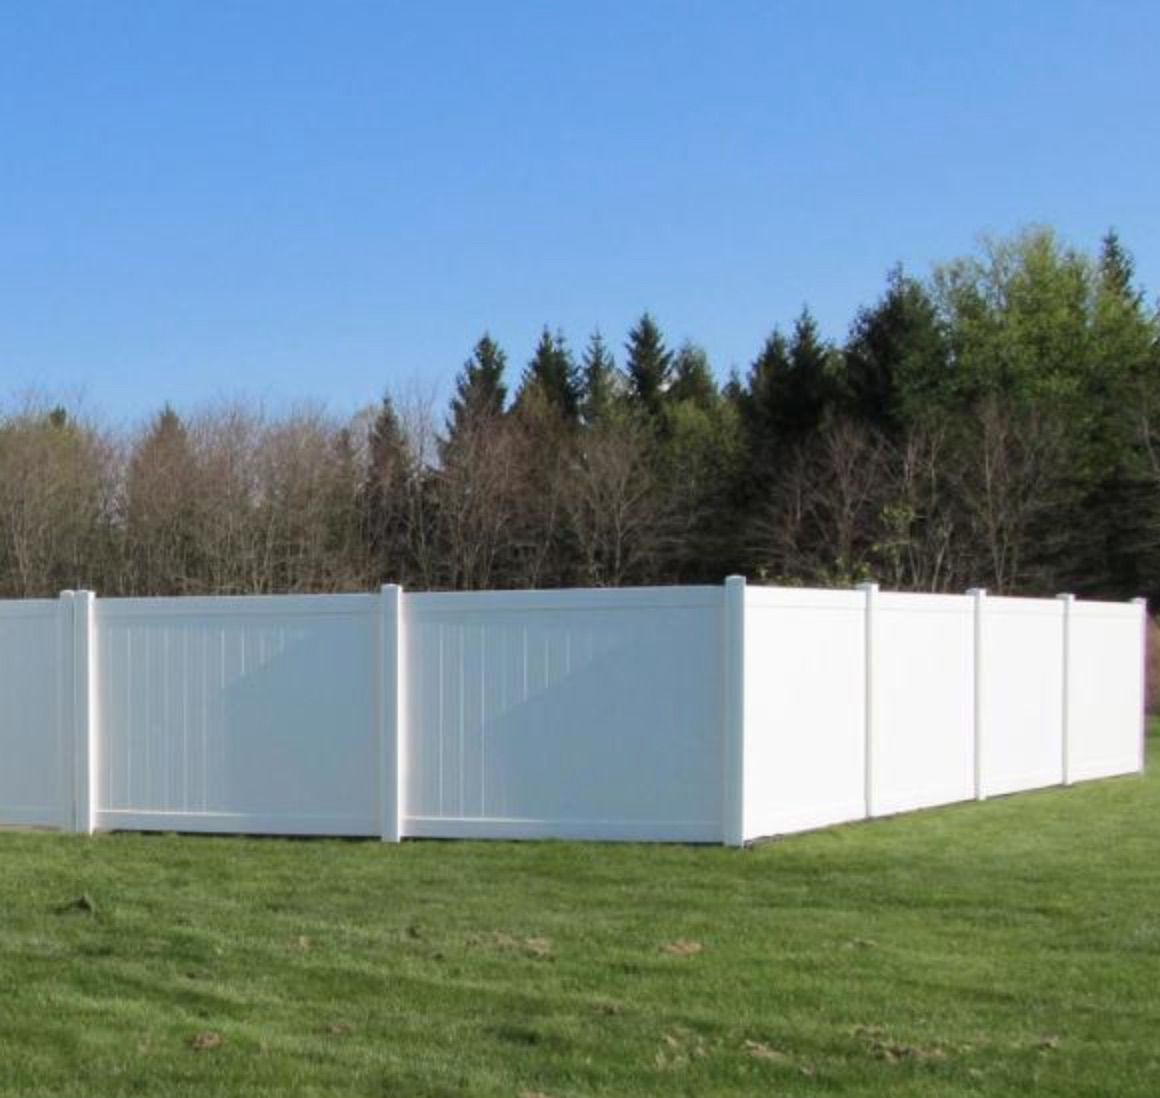 Pembroke White Vinyl Privacy Fence Panel Kit